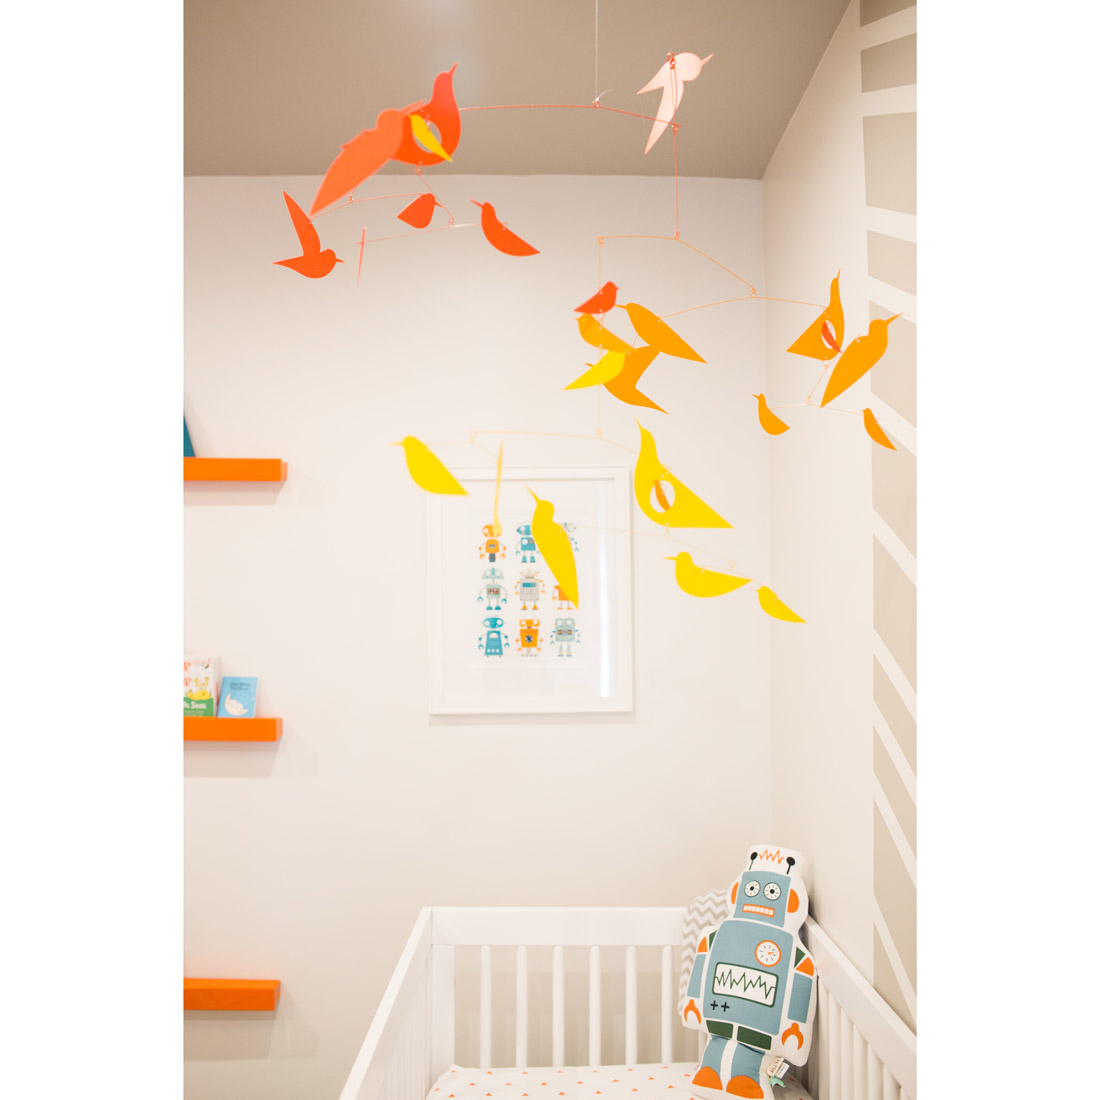 nursery with robot decor and wall art with a moma bird mobile design by sara bates interior design